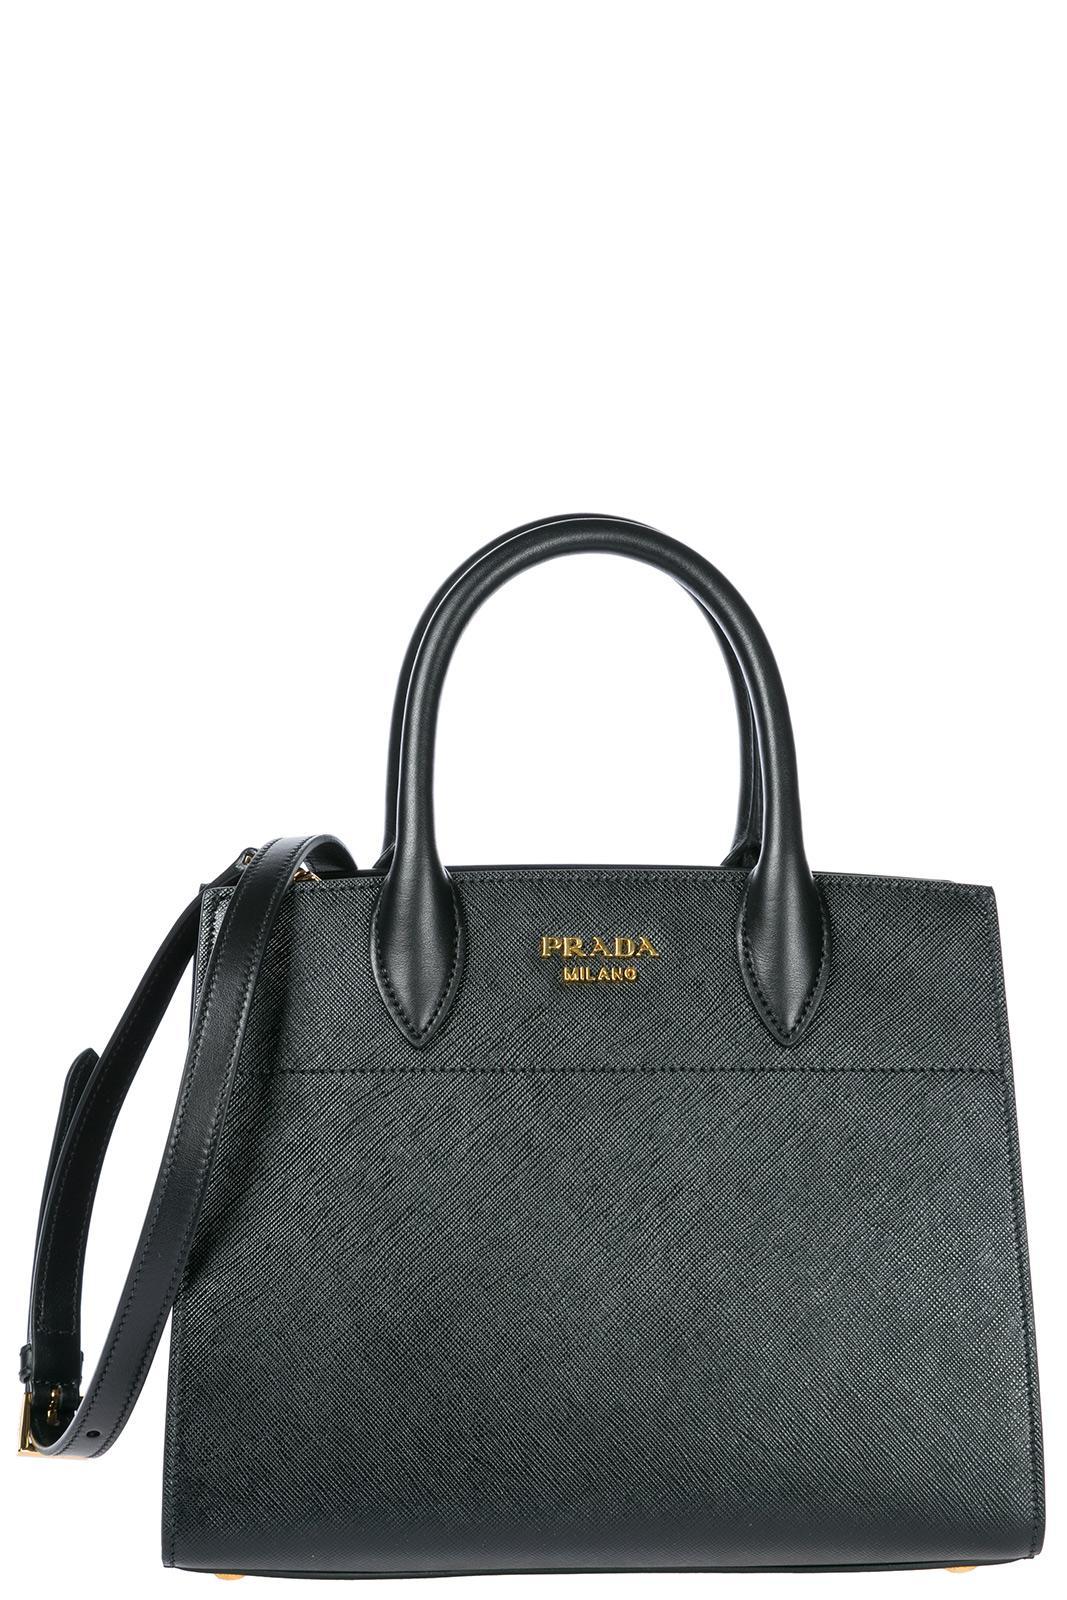 Satchel Bags - Shoulder Bag Grained Leather Nero - black - Satchel Bags for ladies Prada SxSe15eH